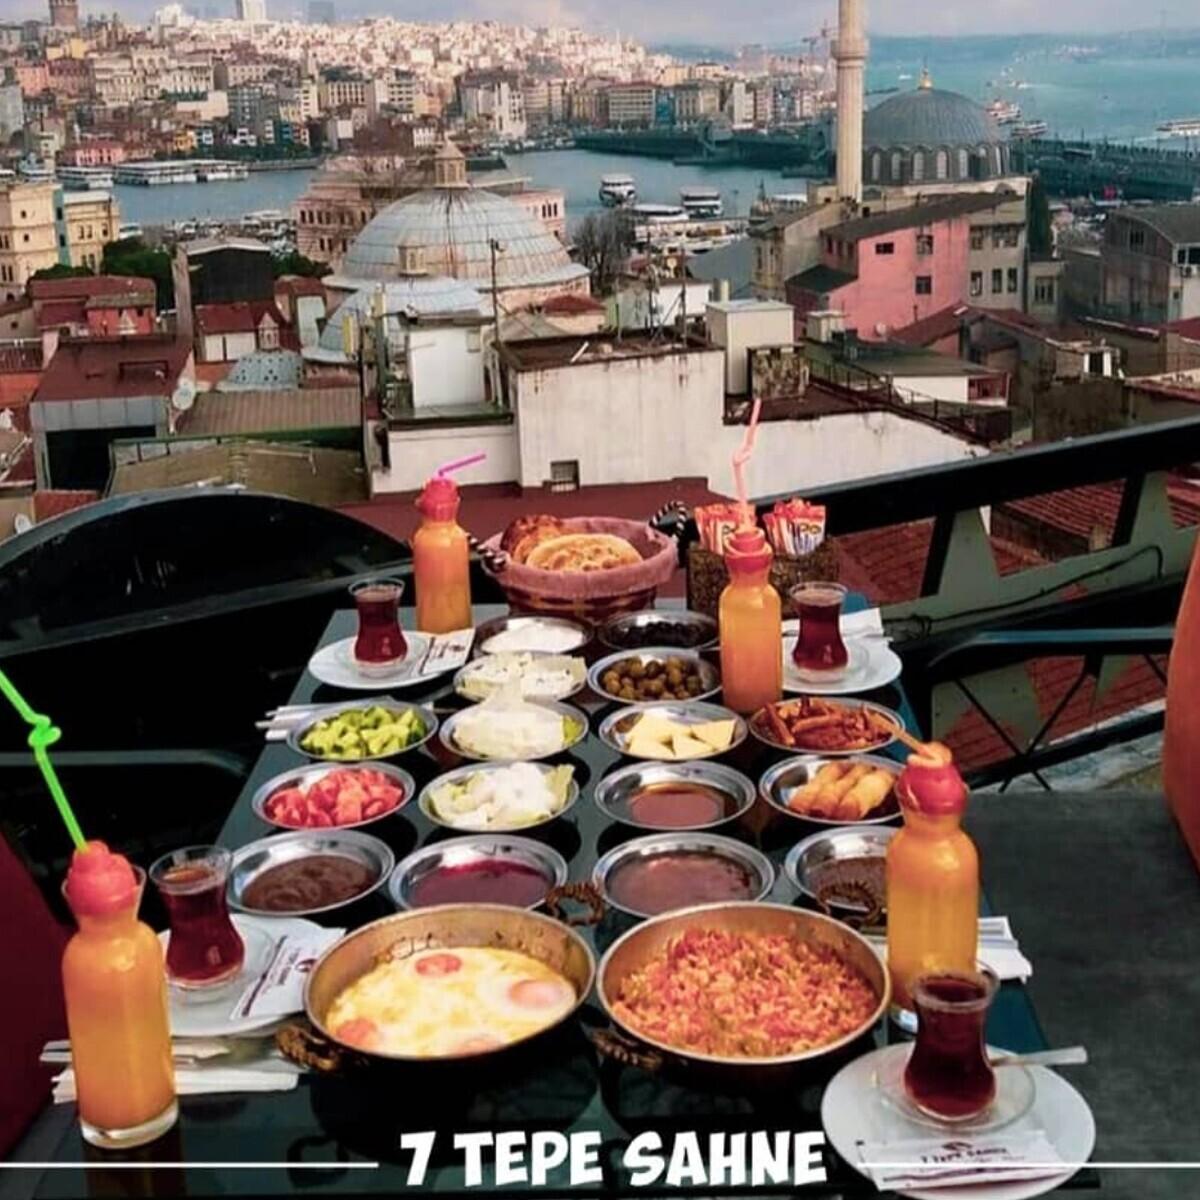 7 Tepe Sahne'den Denize Nazır Leziz Serpme Kahvaltı Menüsü